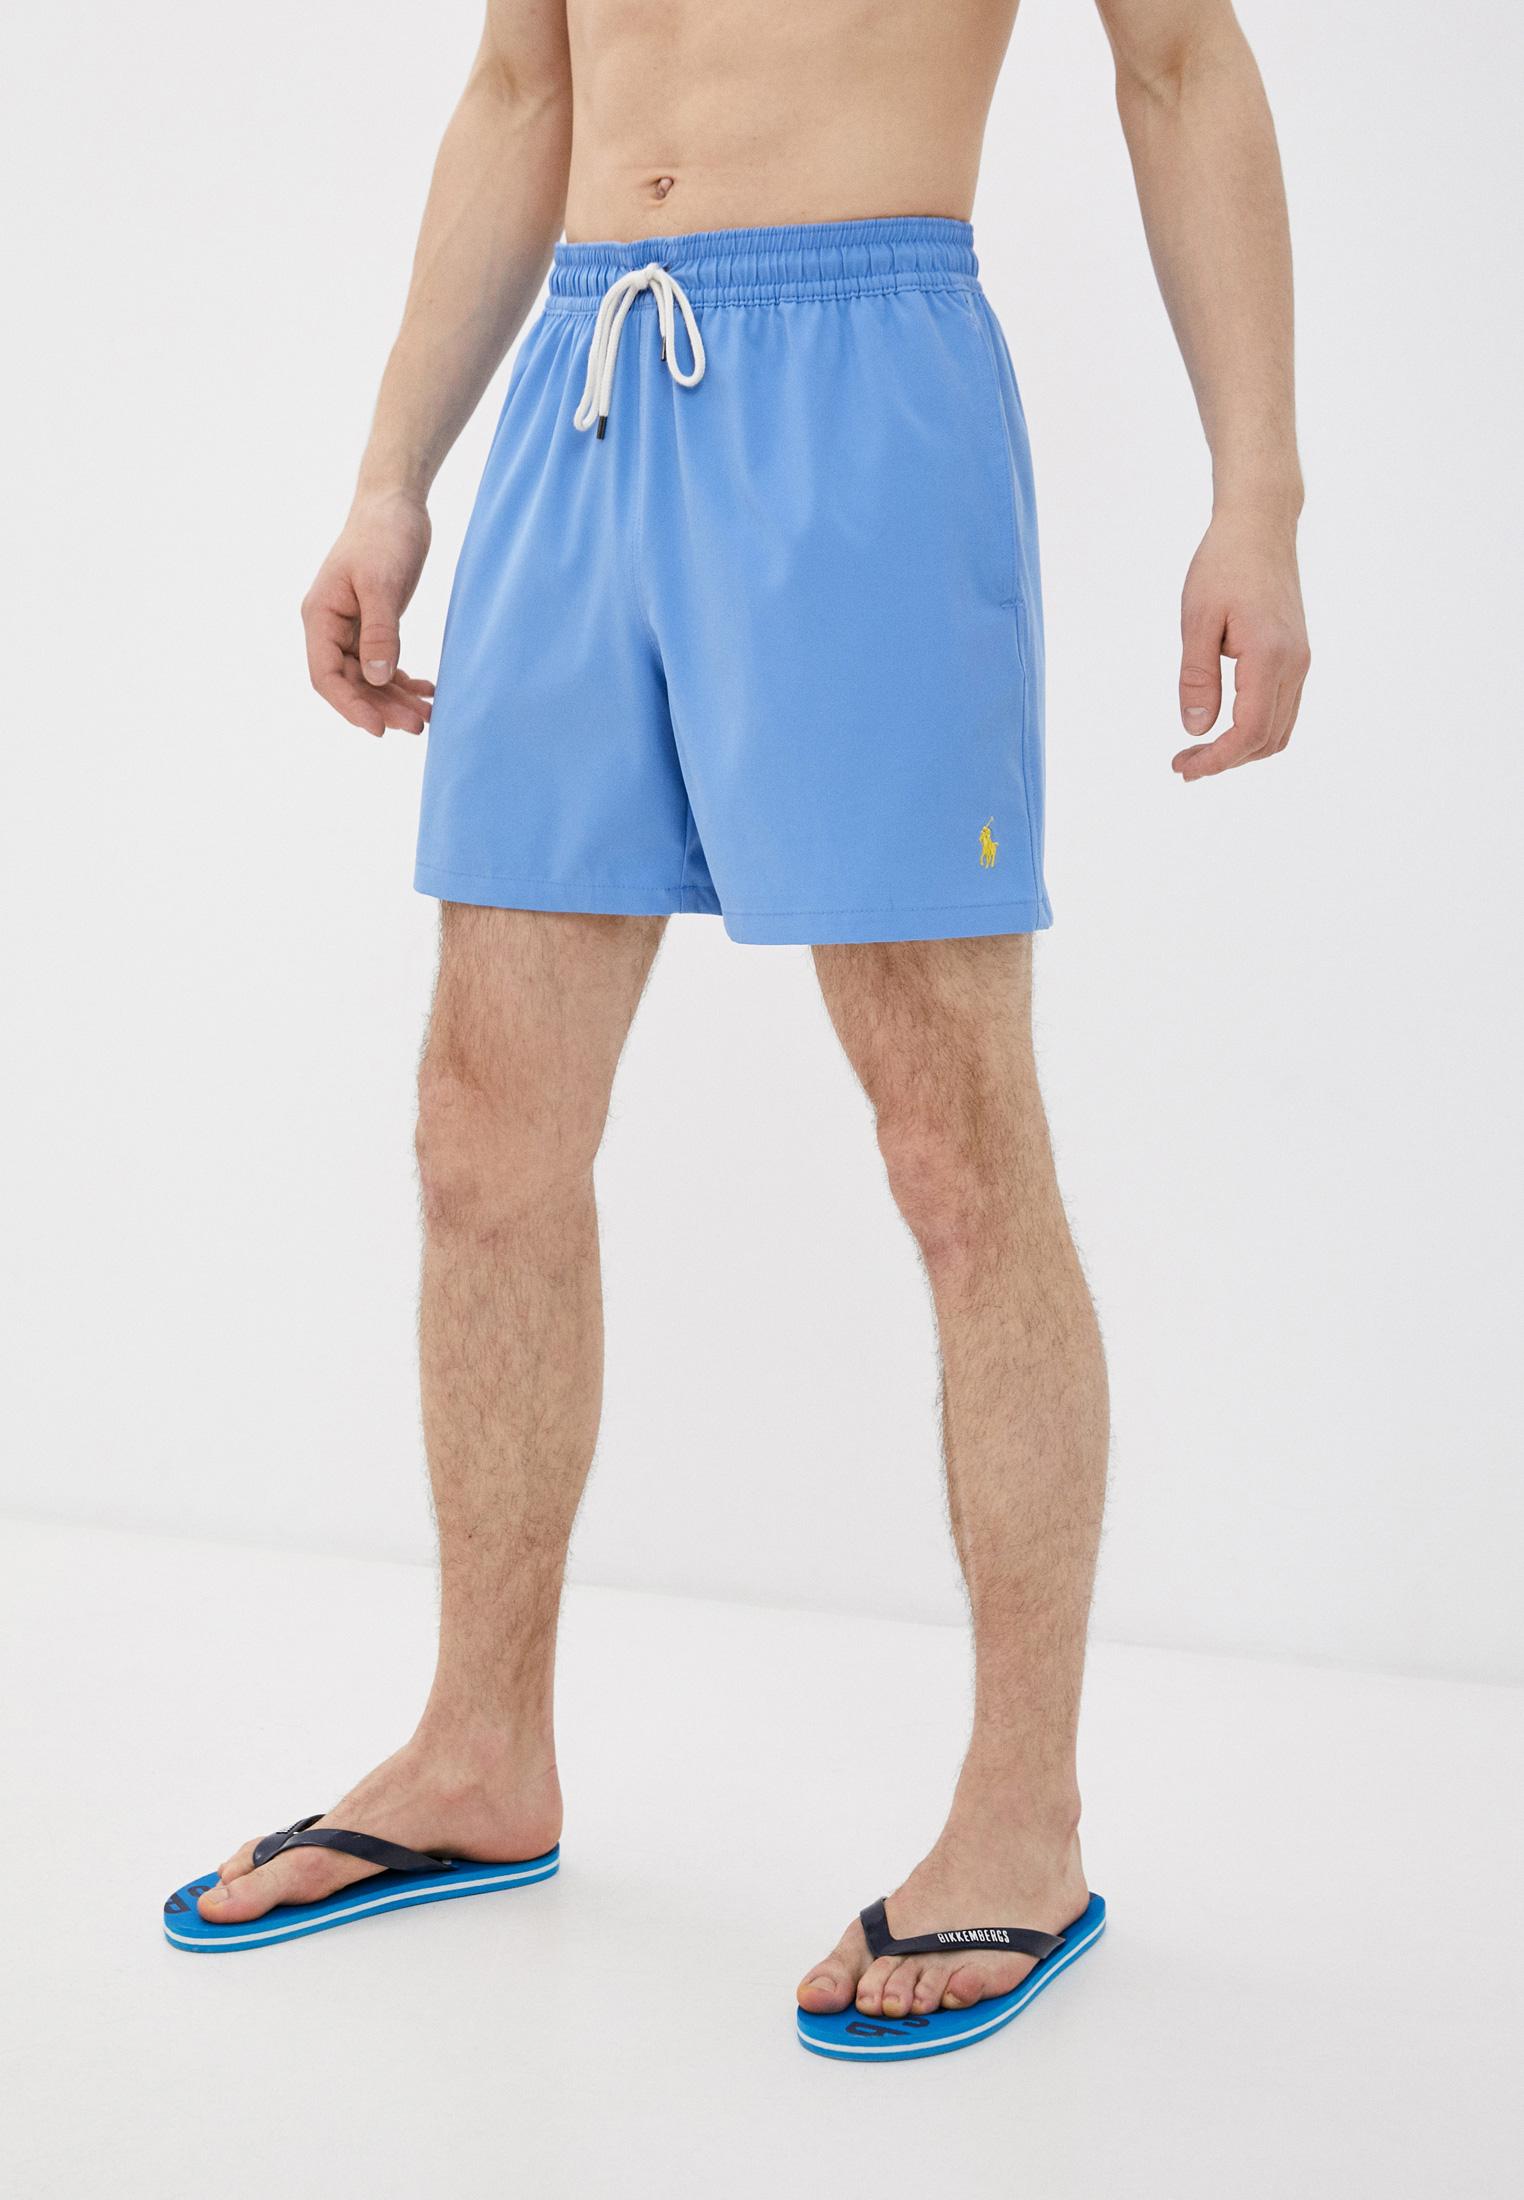 Мужские шорты для плавания Polo Ralph Lauren (Поло Ральф Лорен) Шорты для плавания Polo Ralph Lauren